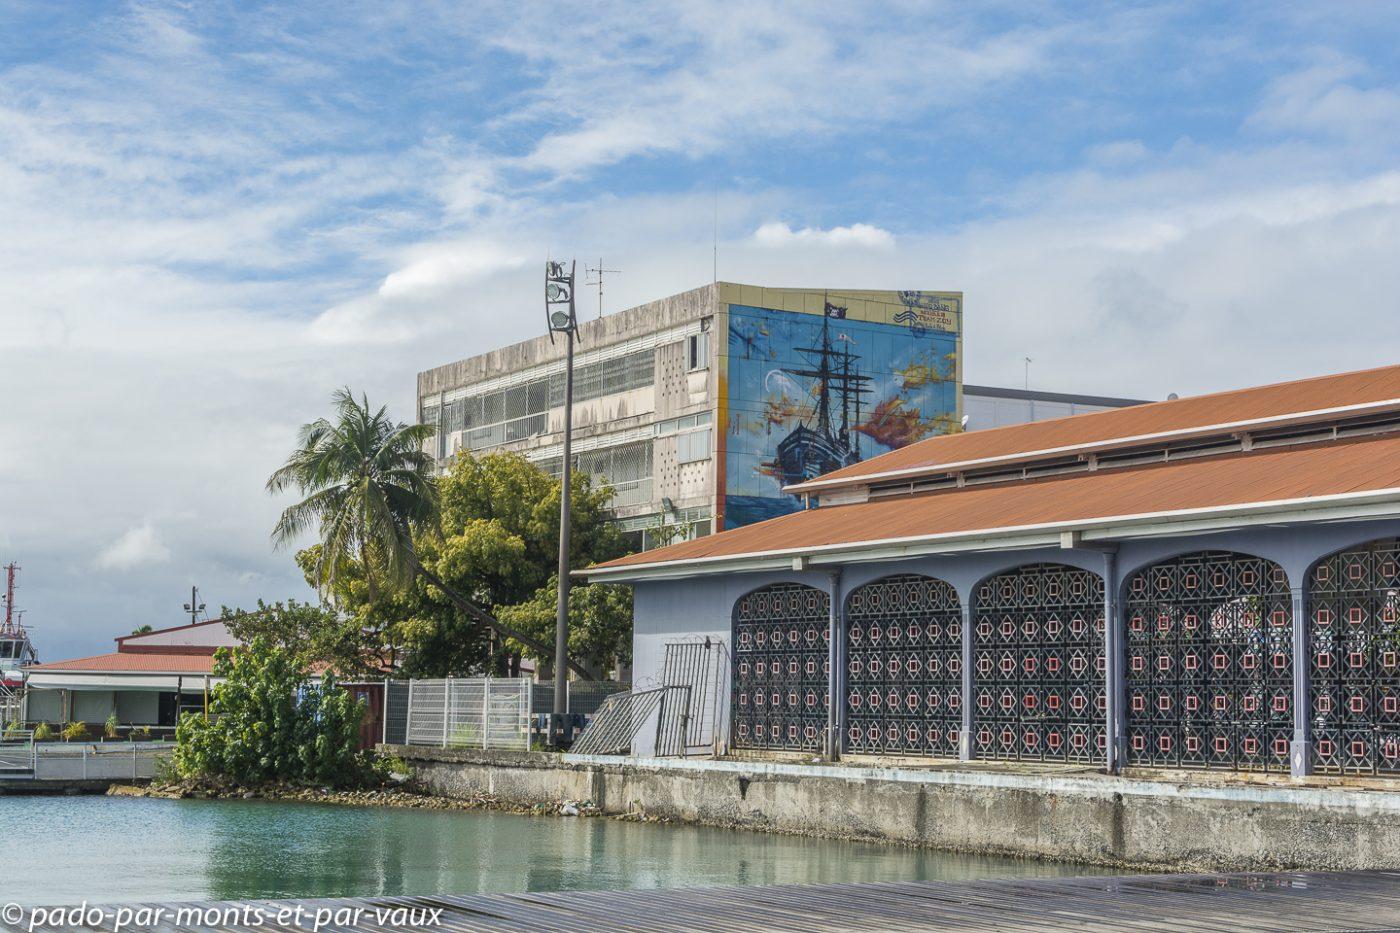 2021-Guadeloupe- Pointe à Pitre- Marché de la darse